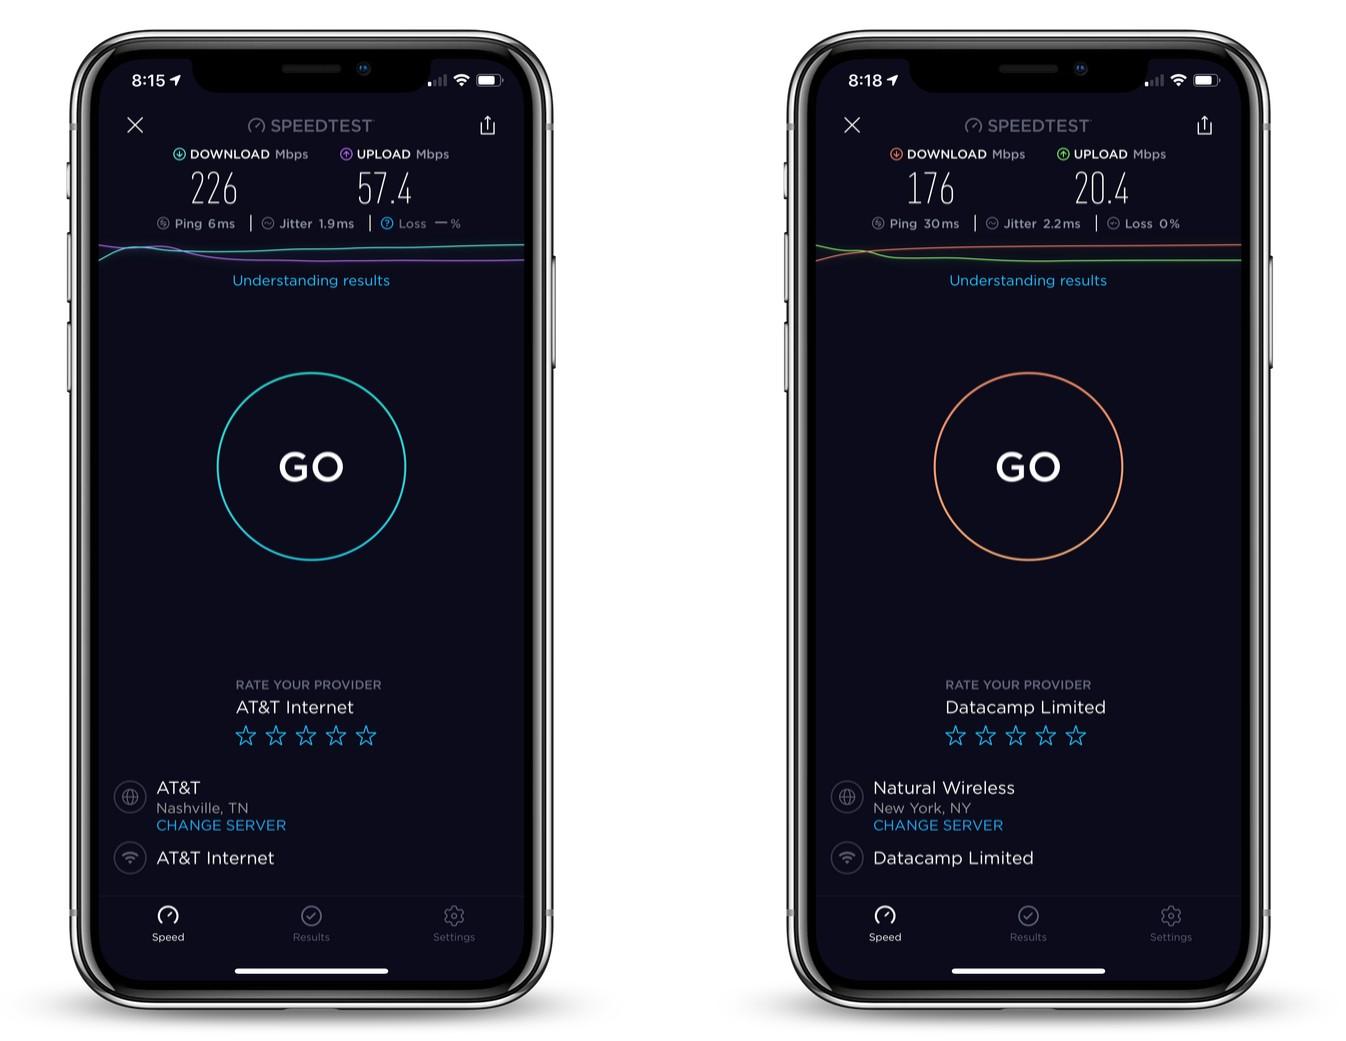 cyberghost_vpn_review_ios_speed_test